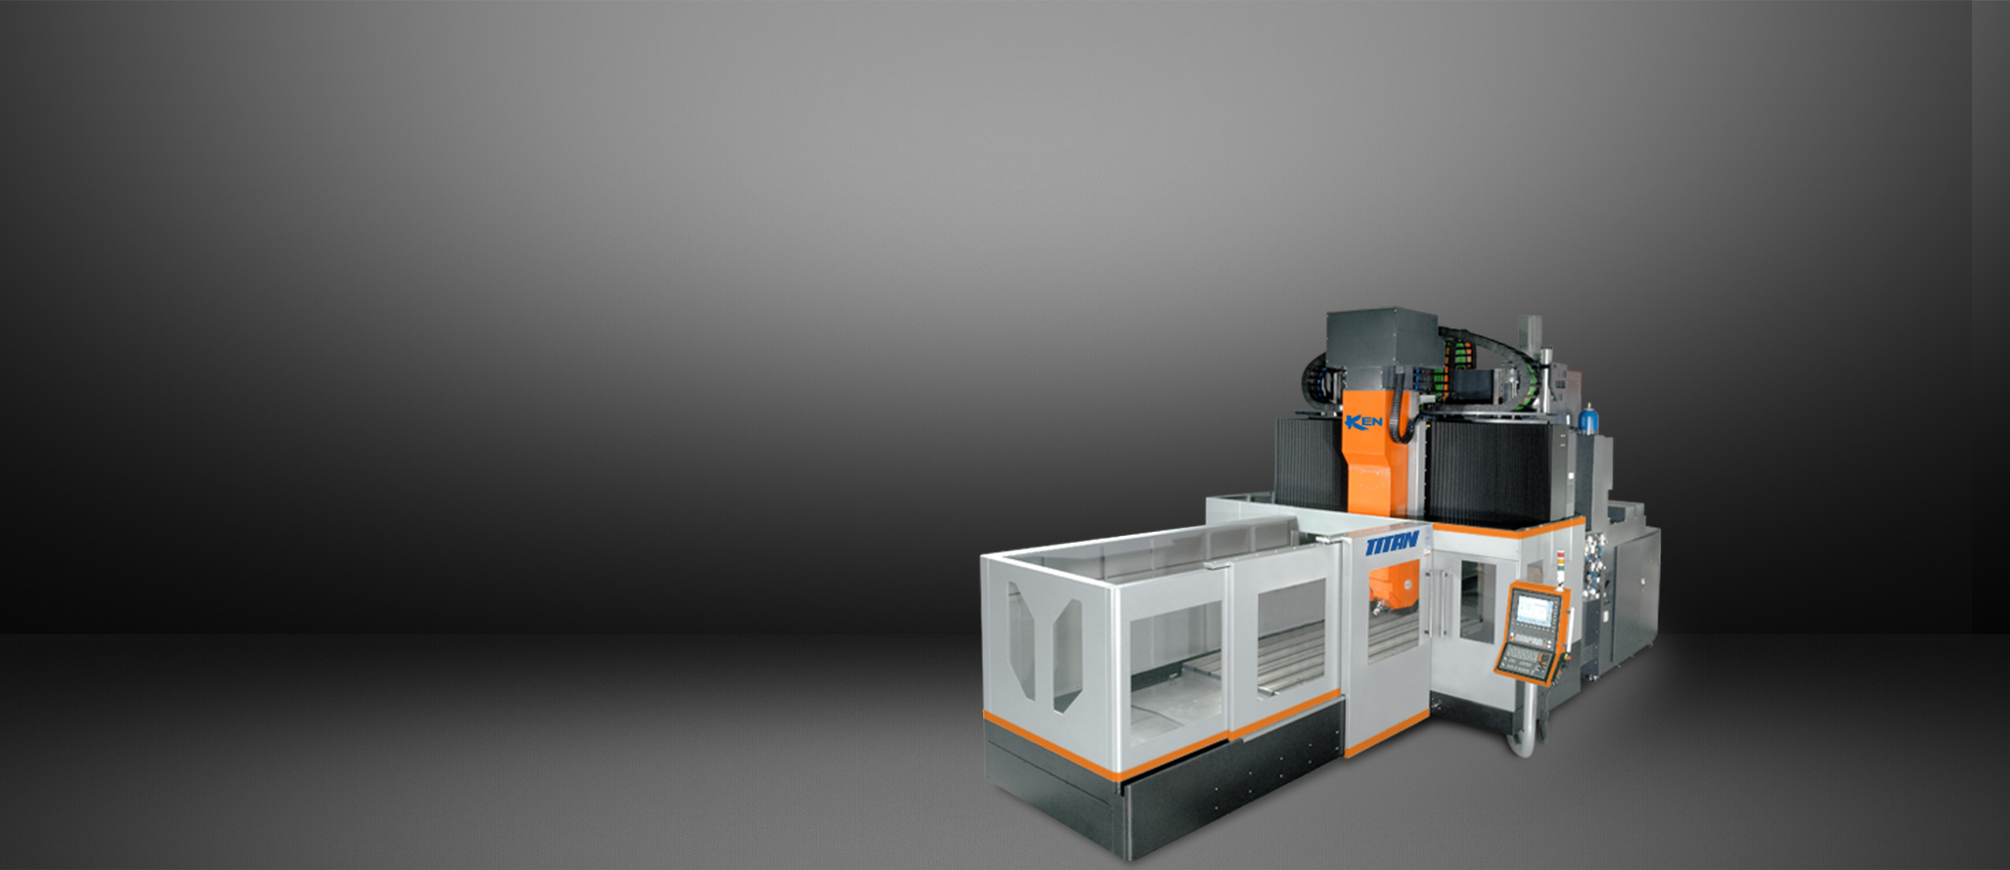 TITAN 3450 Linear Motor 5 Axis